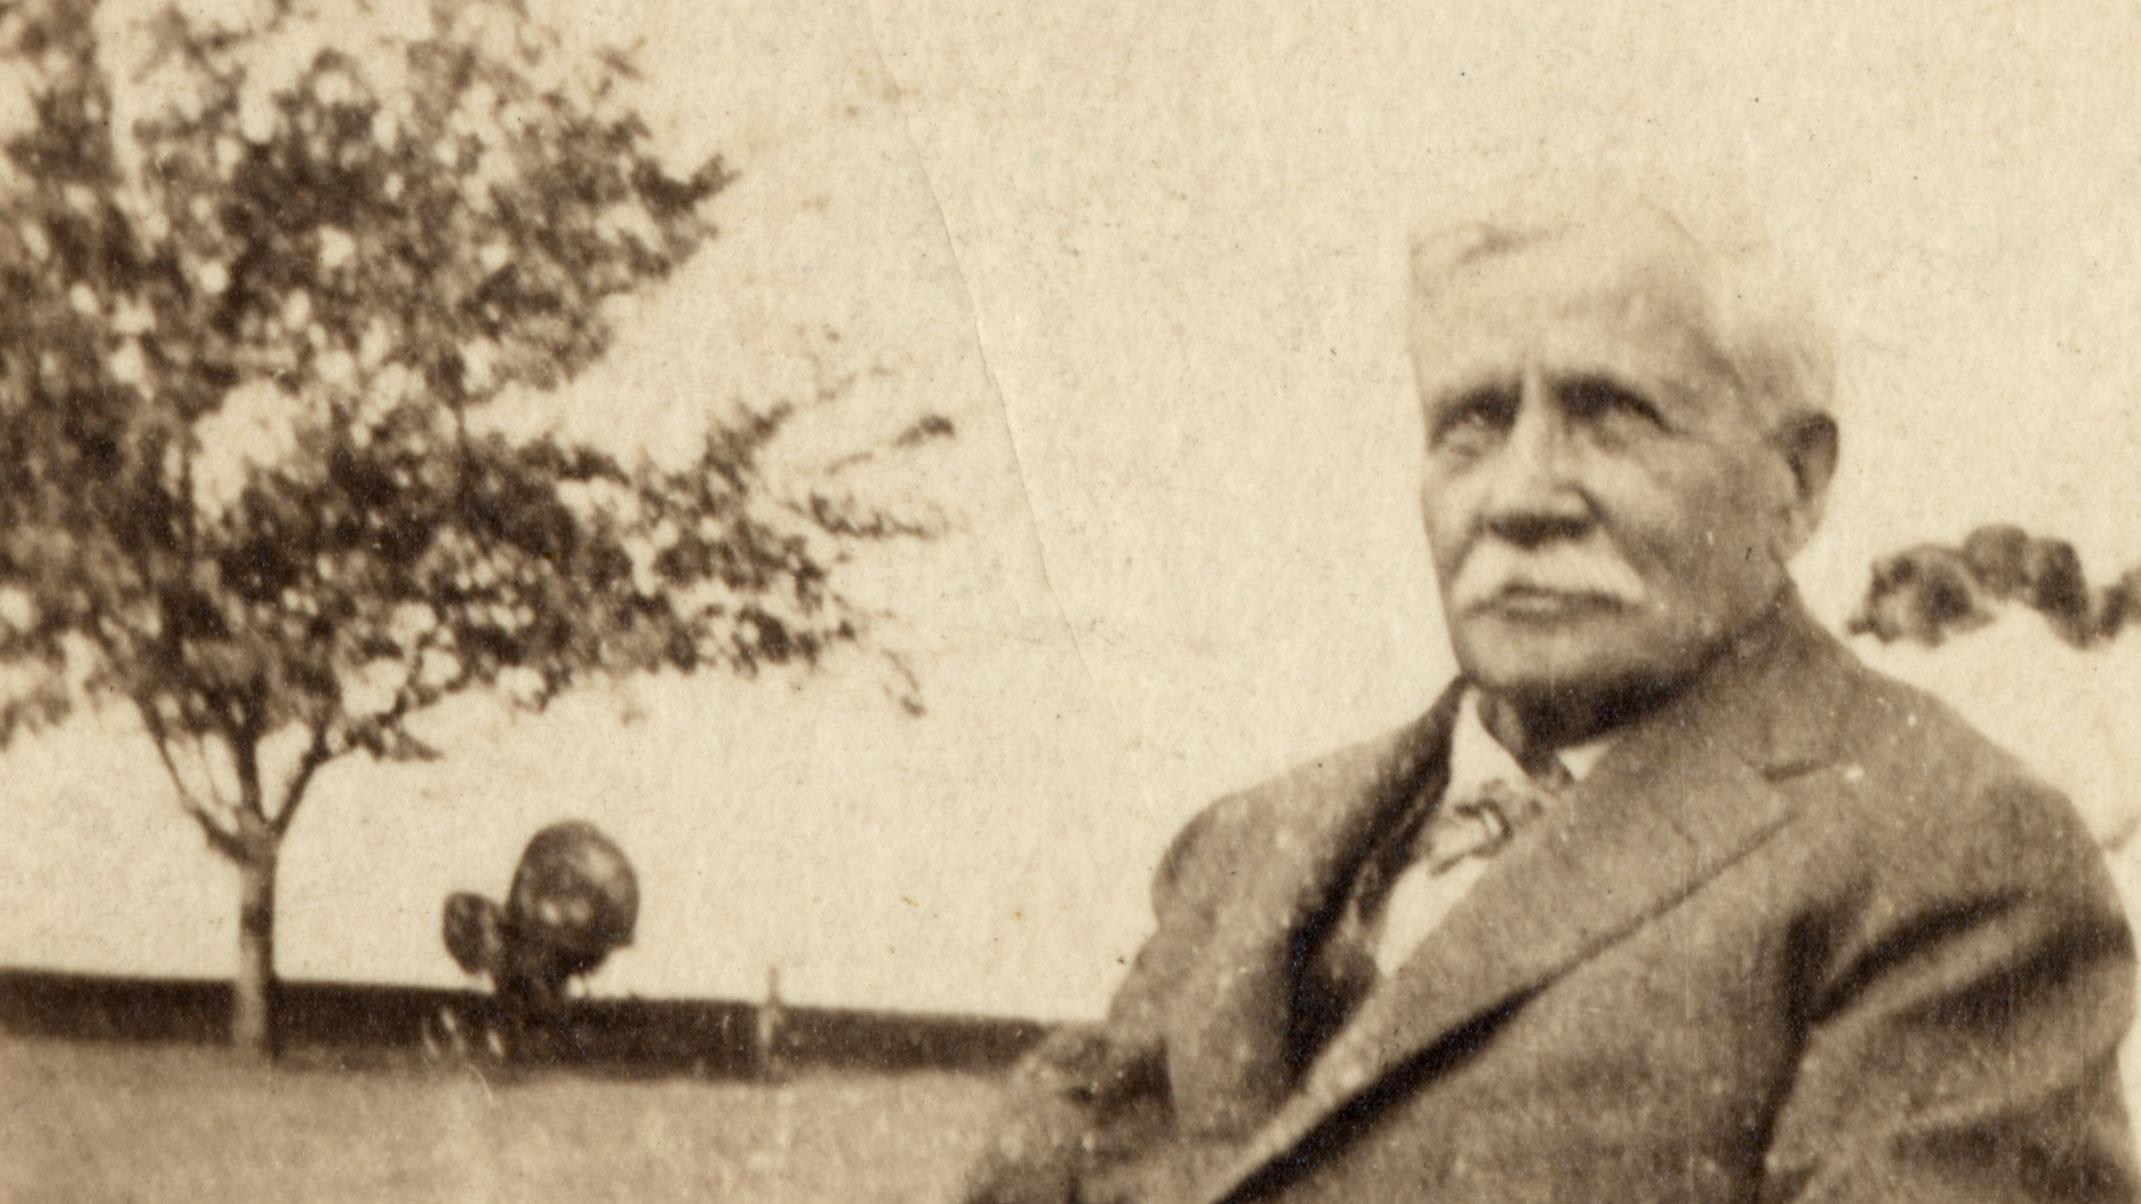 First generation leader of SC Johnson, Samuel Curtis Johnson